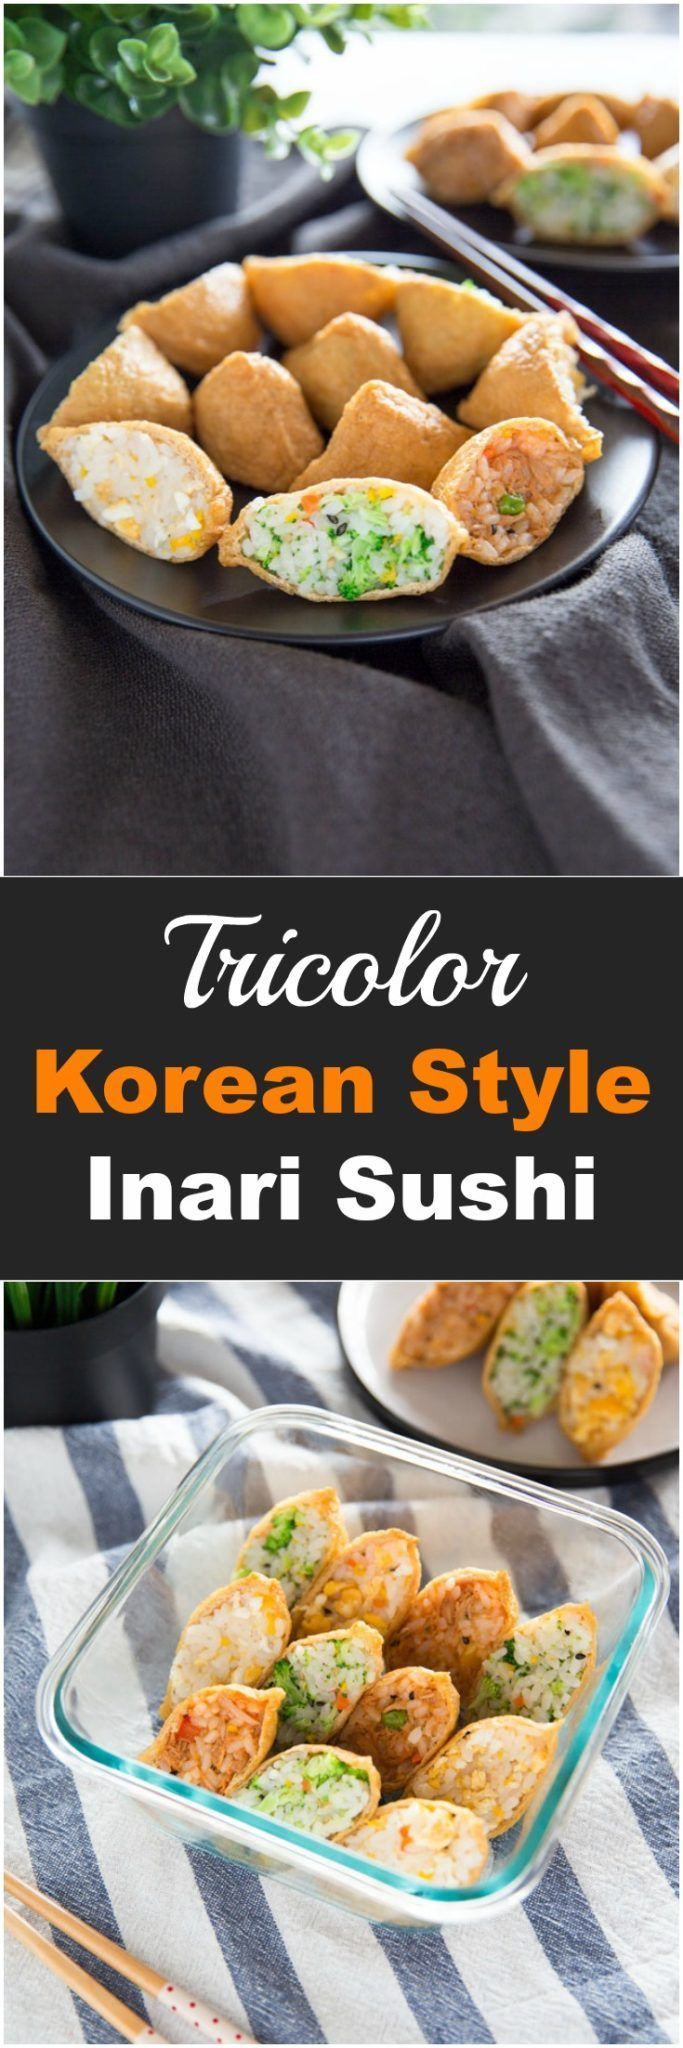 Korean Style Inari Sushi (Sushi Stuffed in Fried Bean Curd Pockets) | MyKoreanKitchen.com via @mykoreankitchen